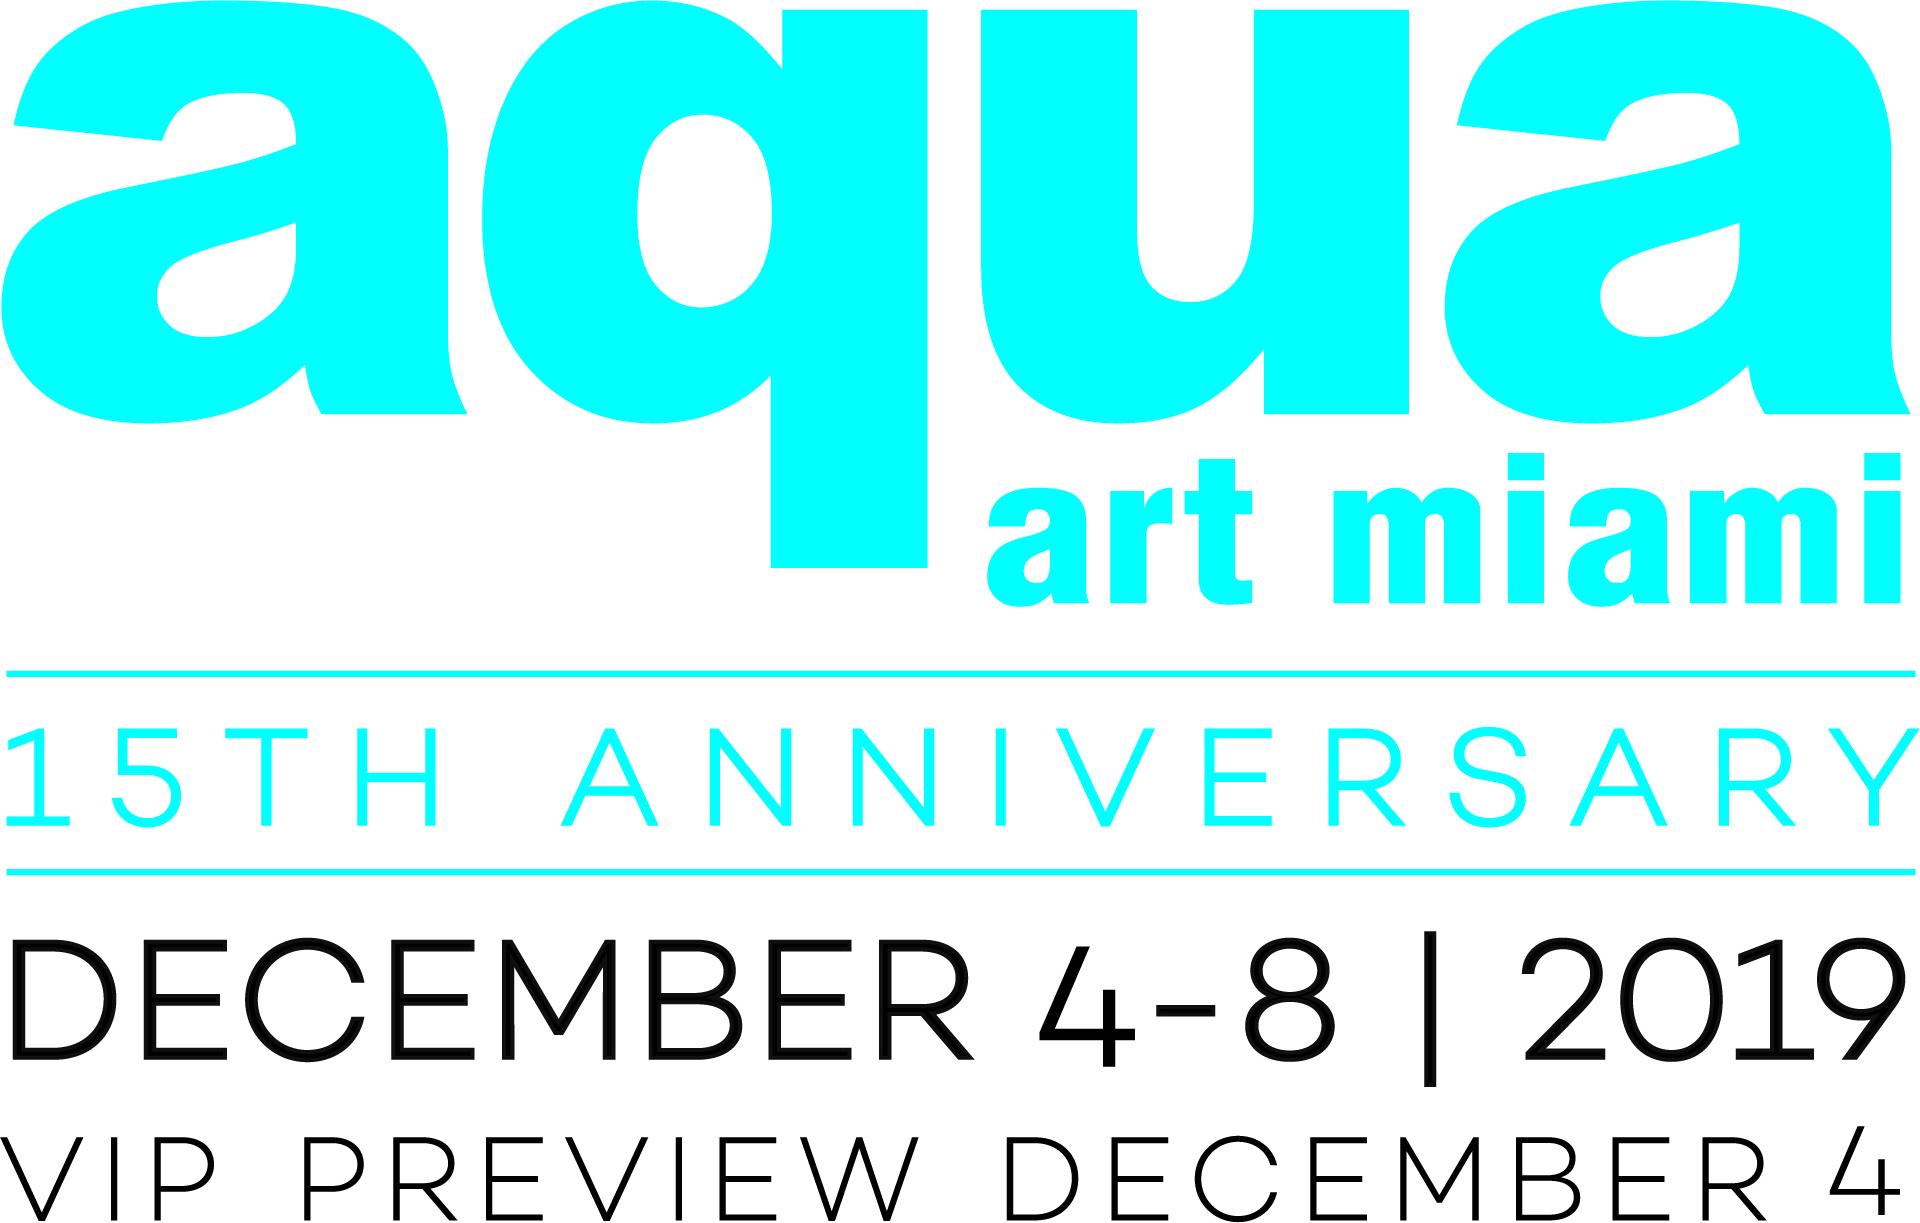 aqua-2019-logo-dates-15anniversary.jpg